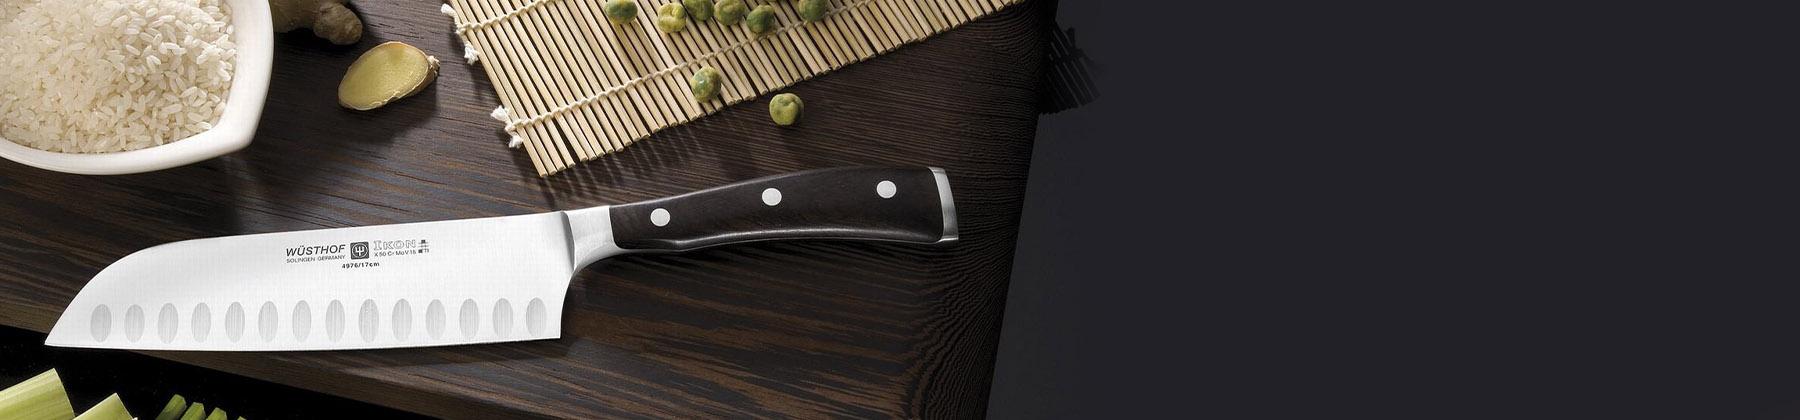 Photo of japanese knives.